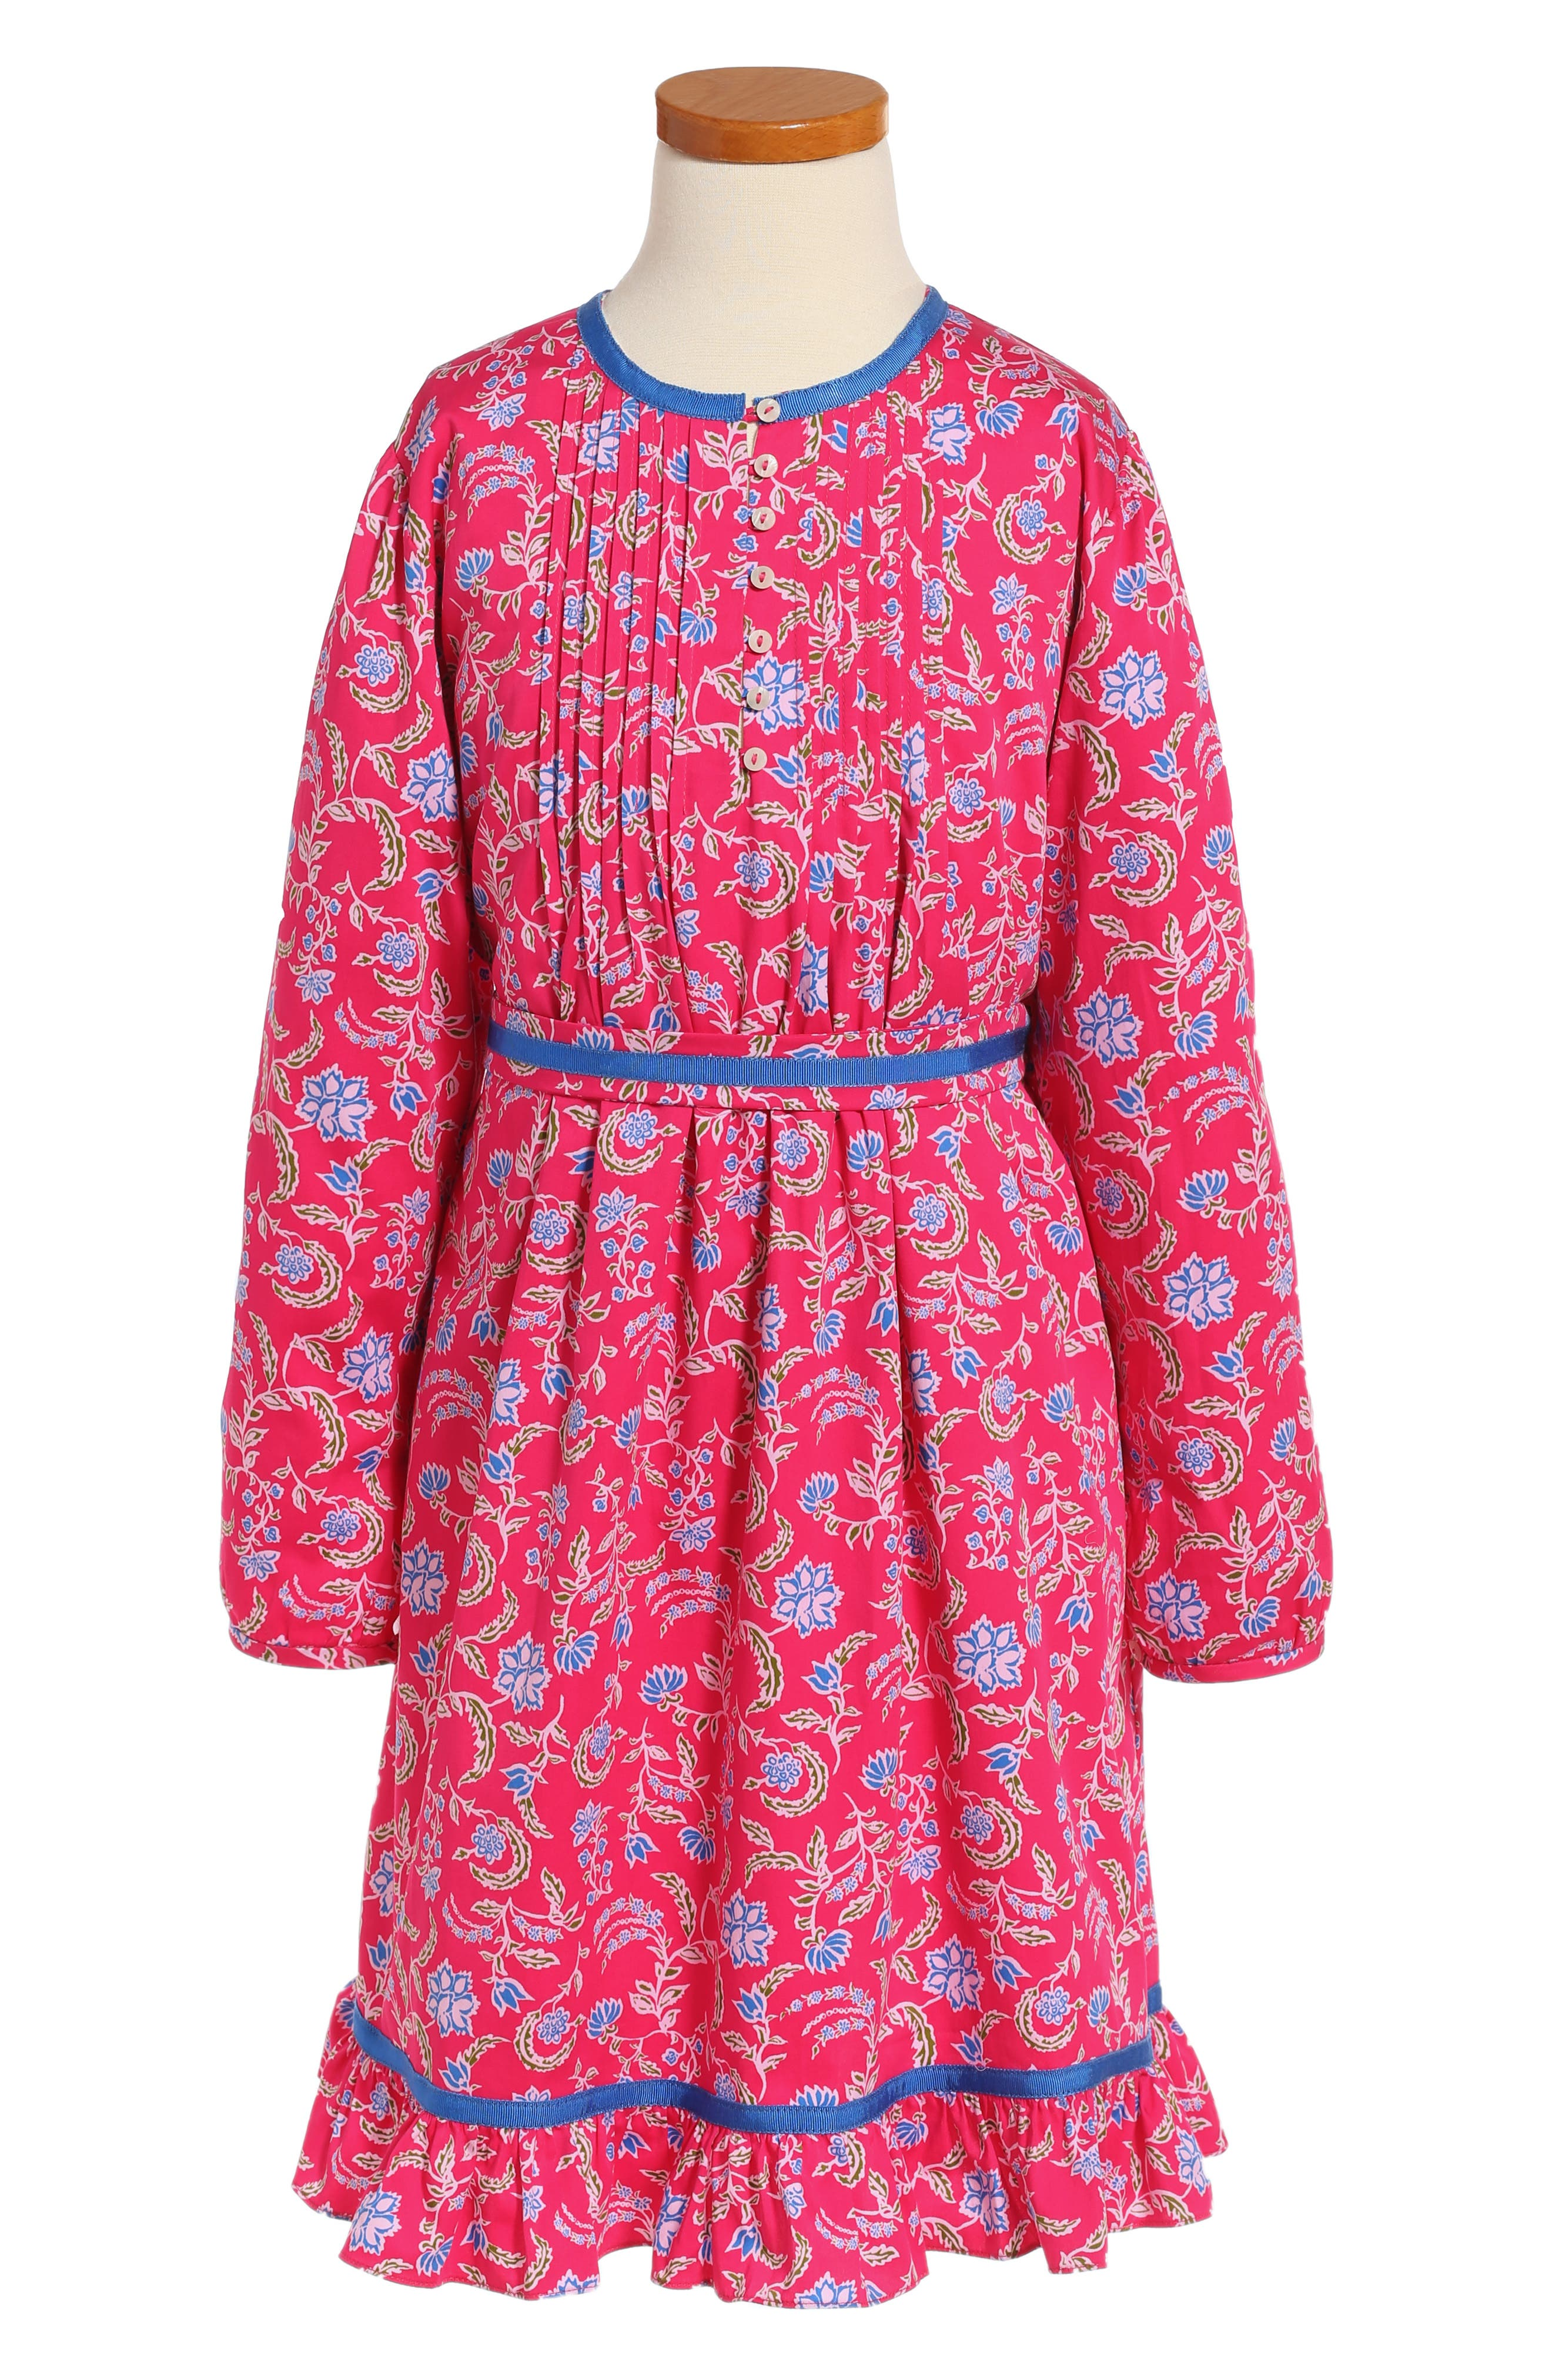 Alternate Image 1 Selected - Oscar de la Renta Lotus Flower Dress (Big Girls)